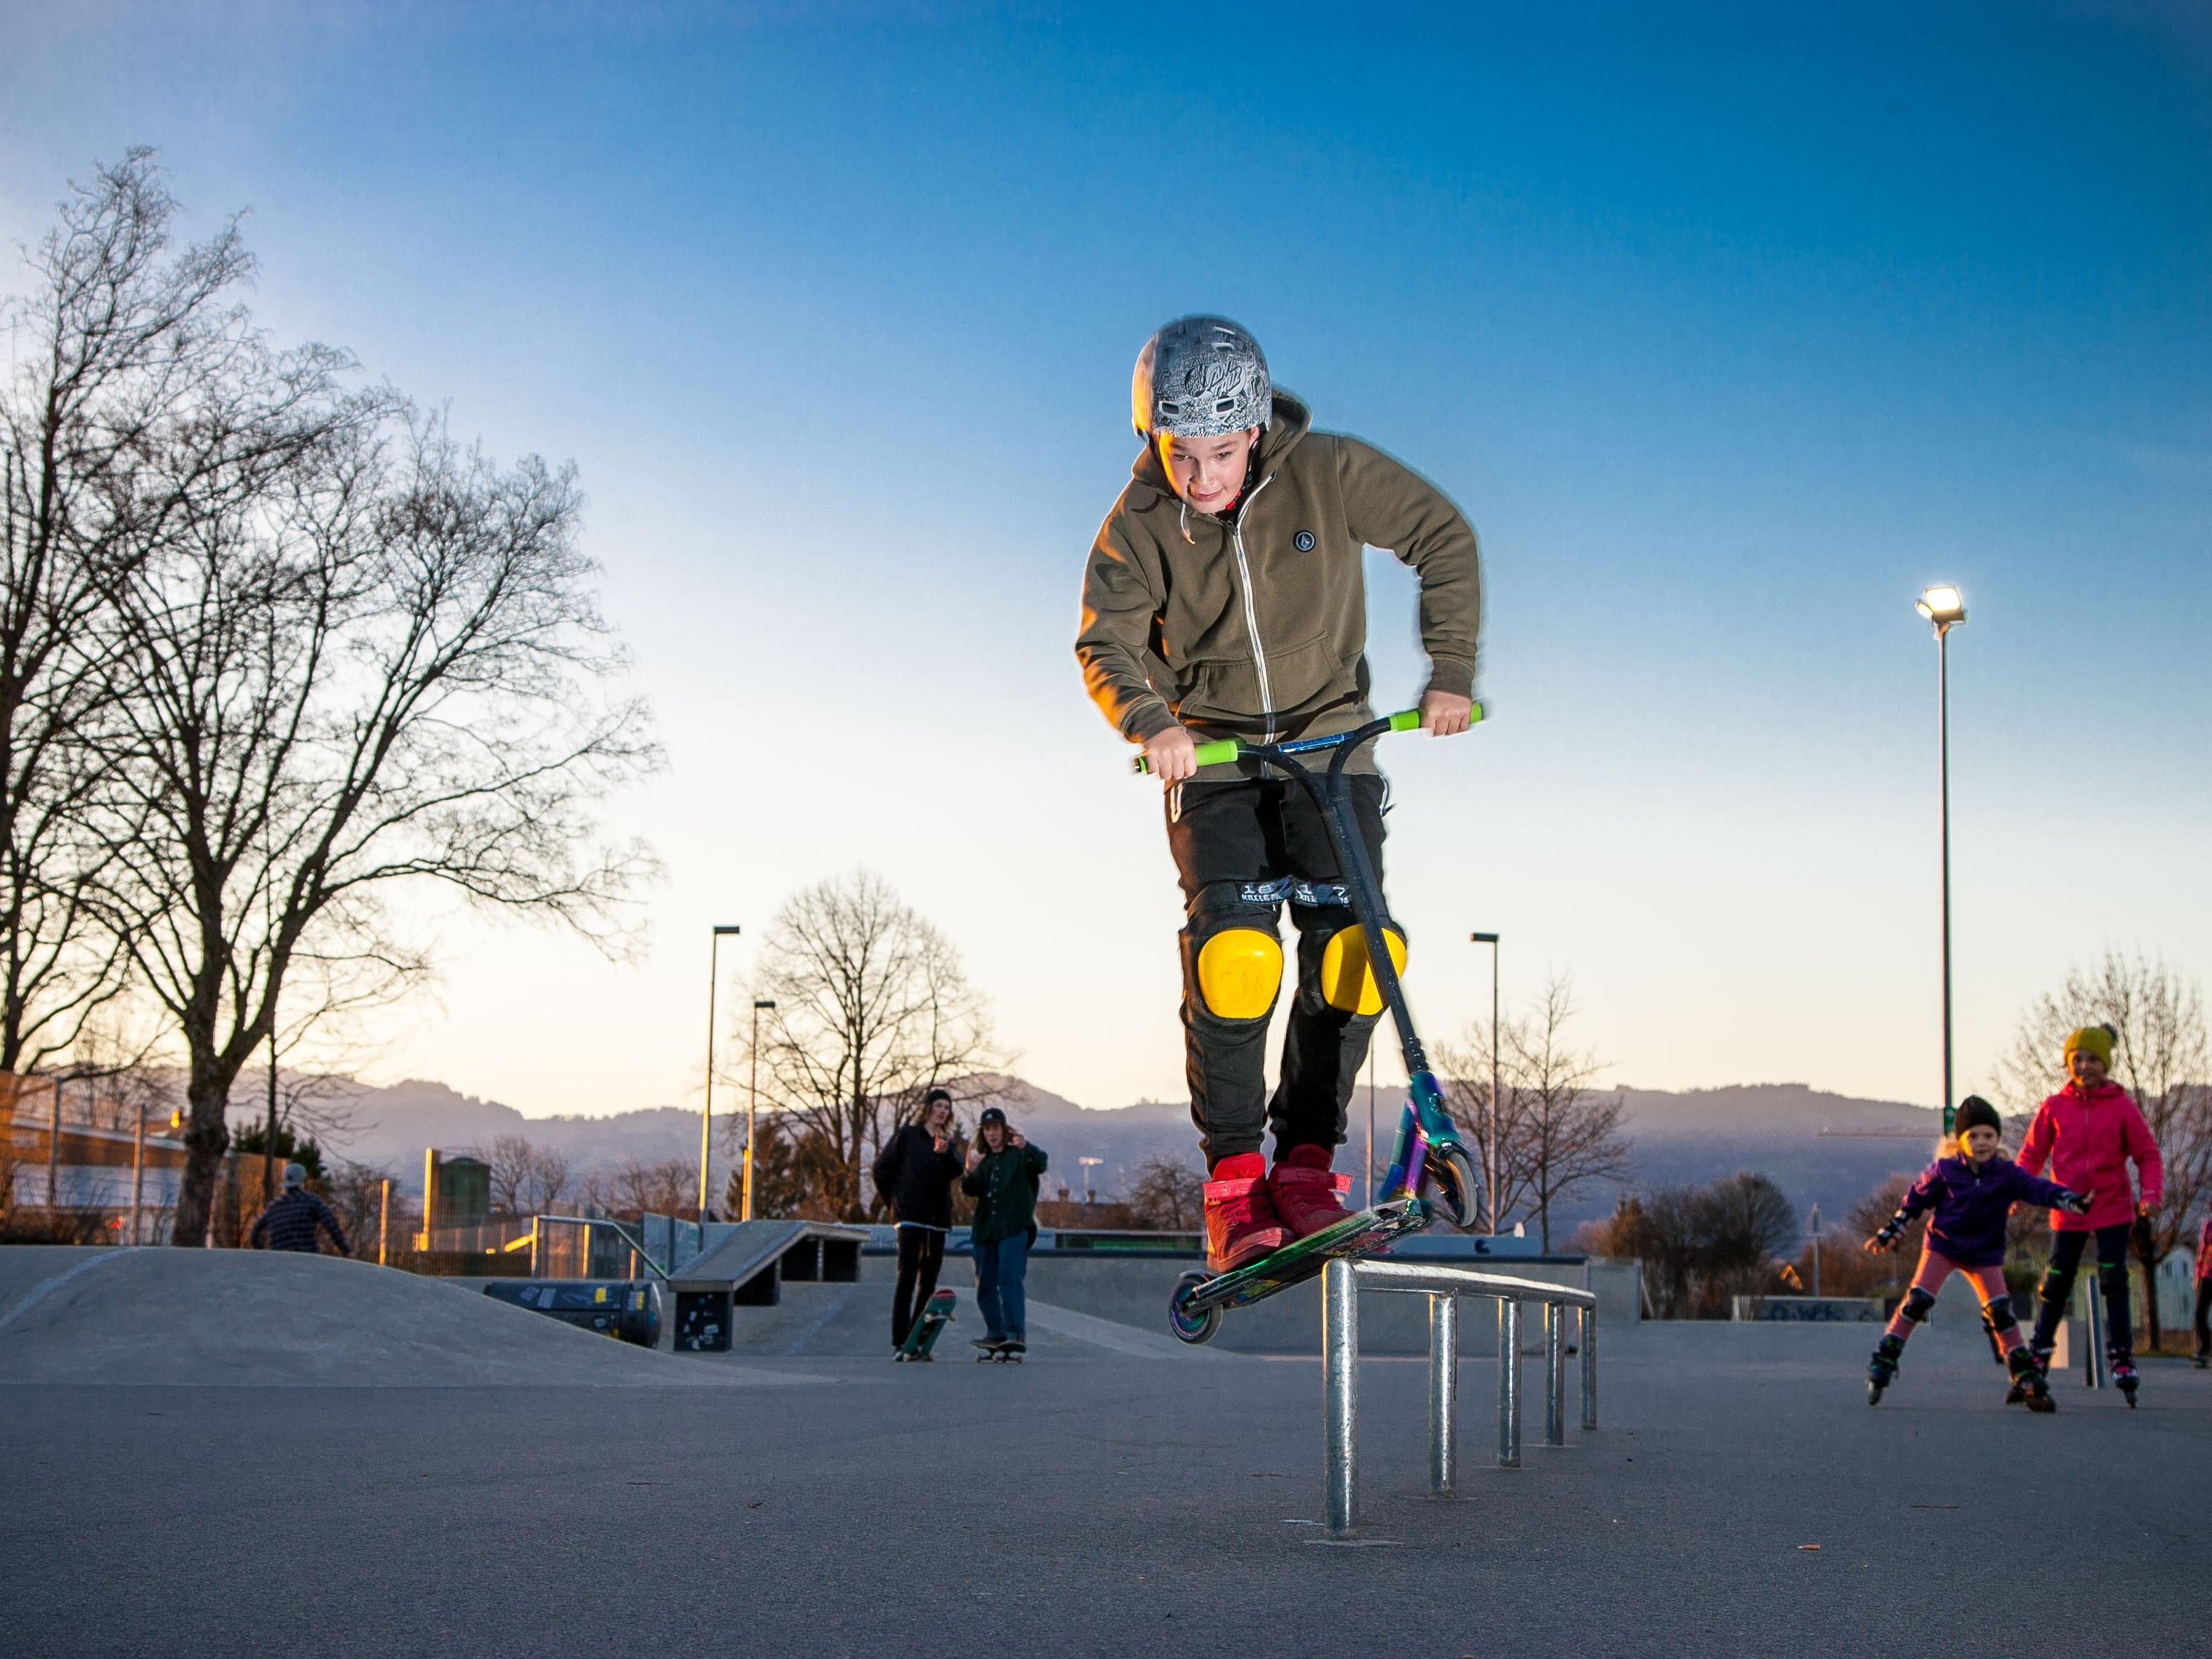 Scooterfahrer Tobias Hehle im Jugendplatz amKumma